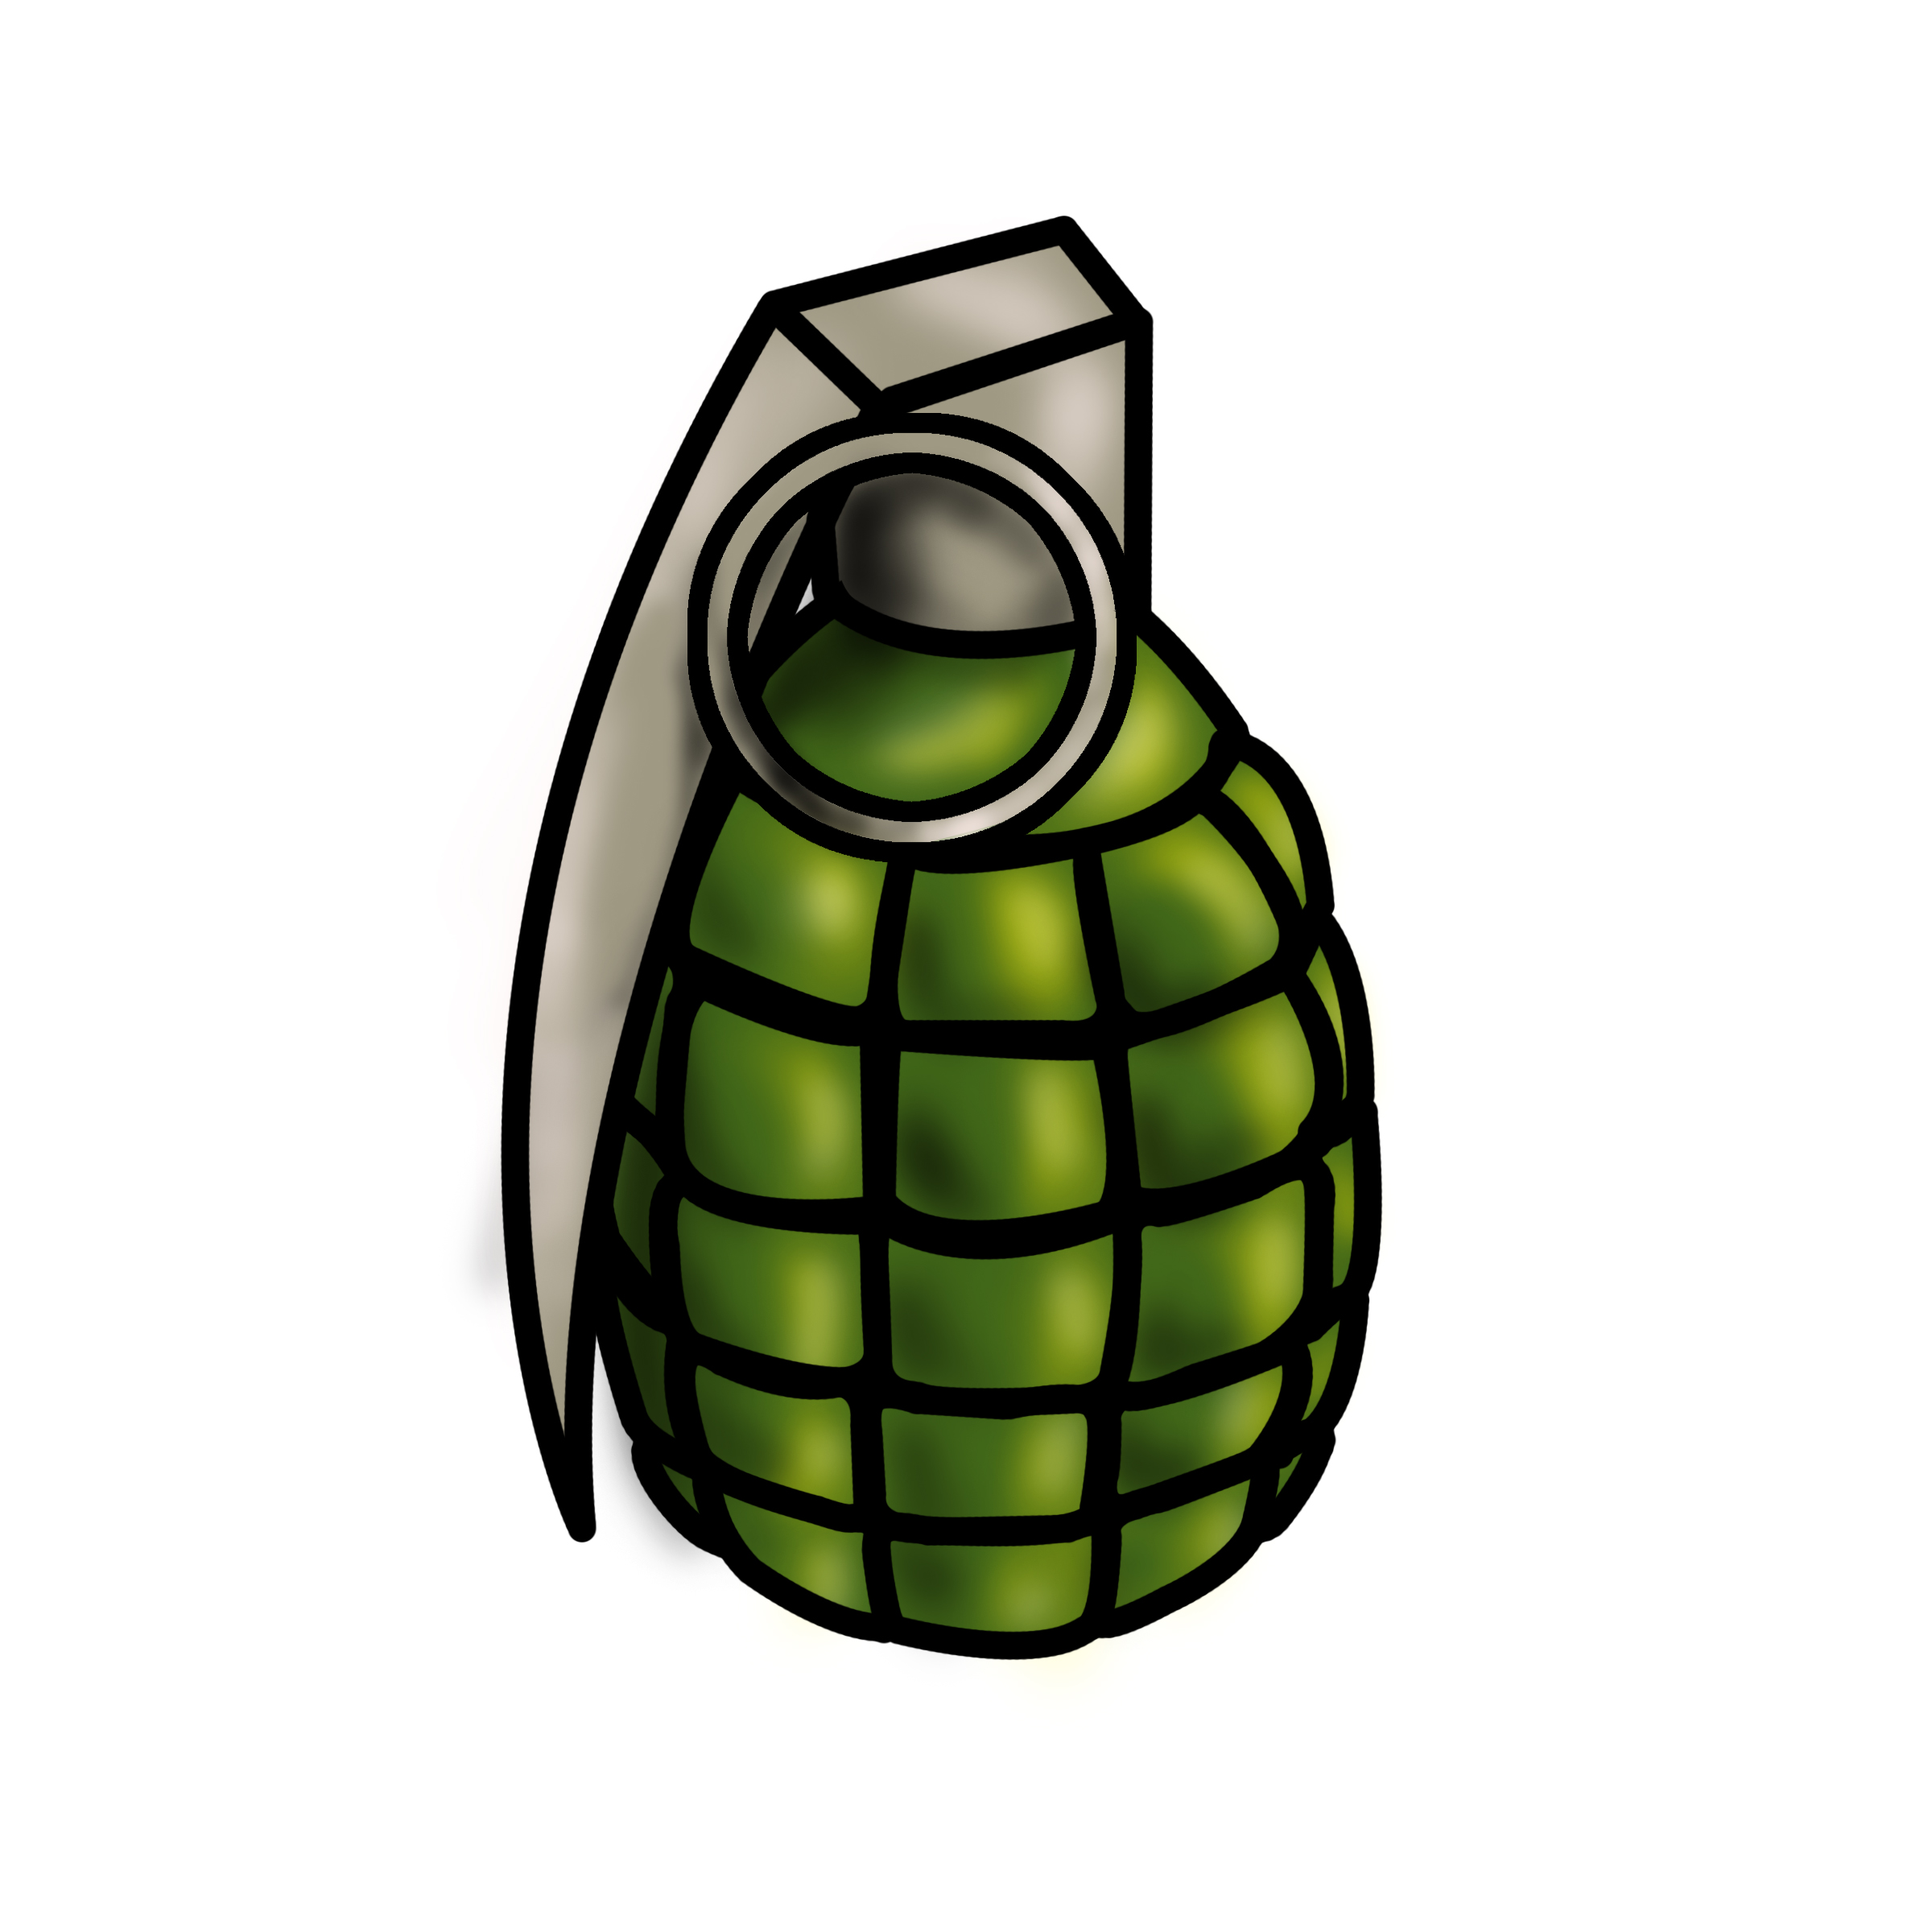 Drawn grenade #4